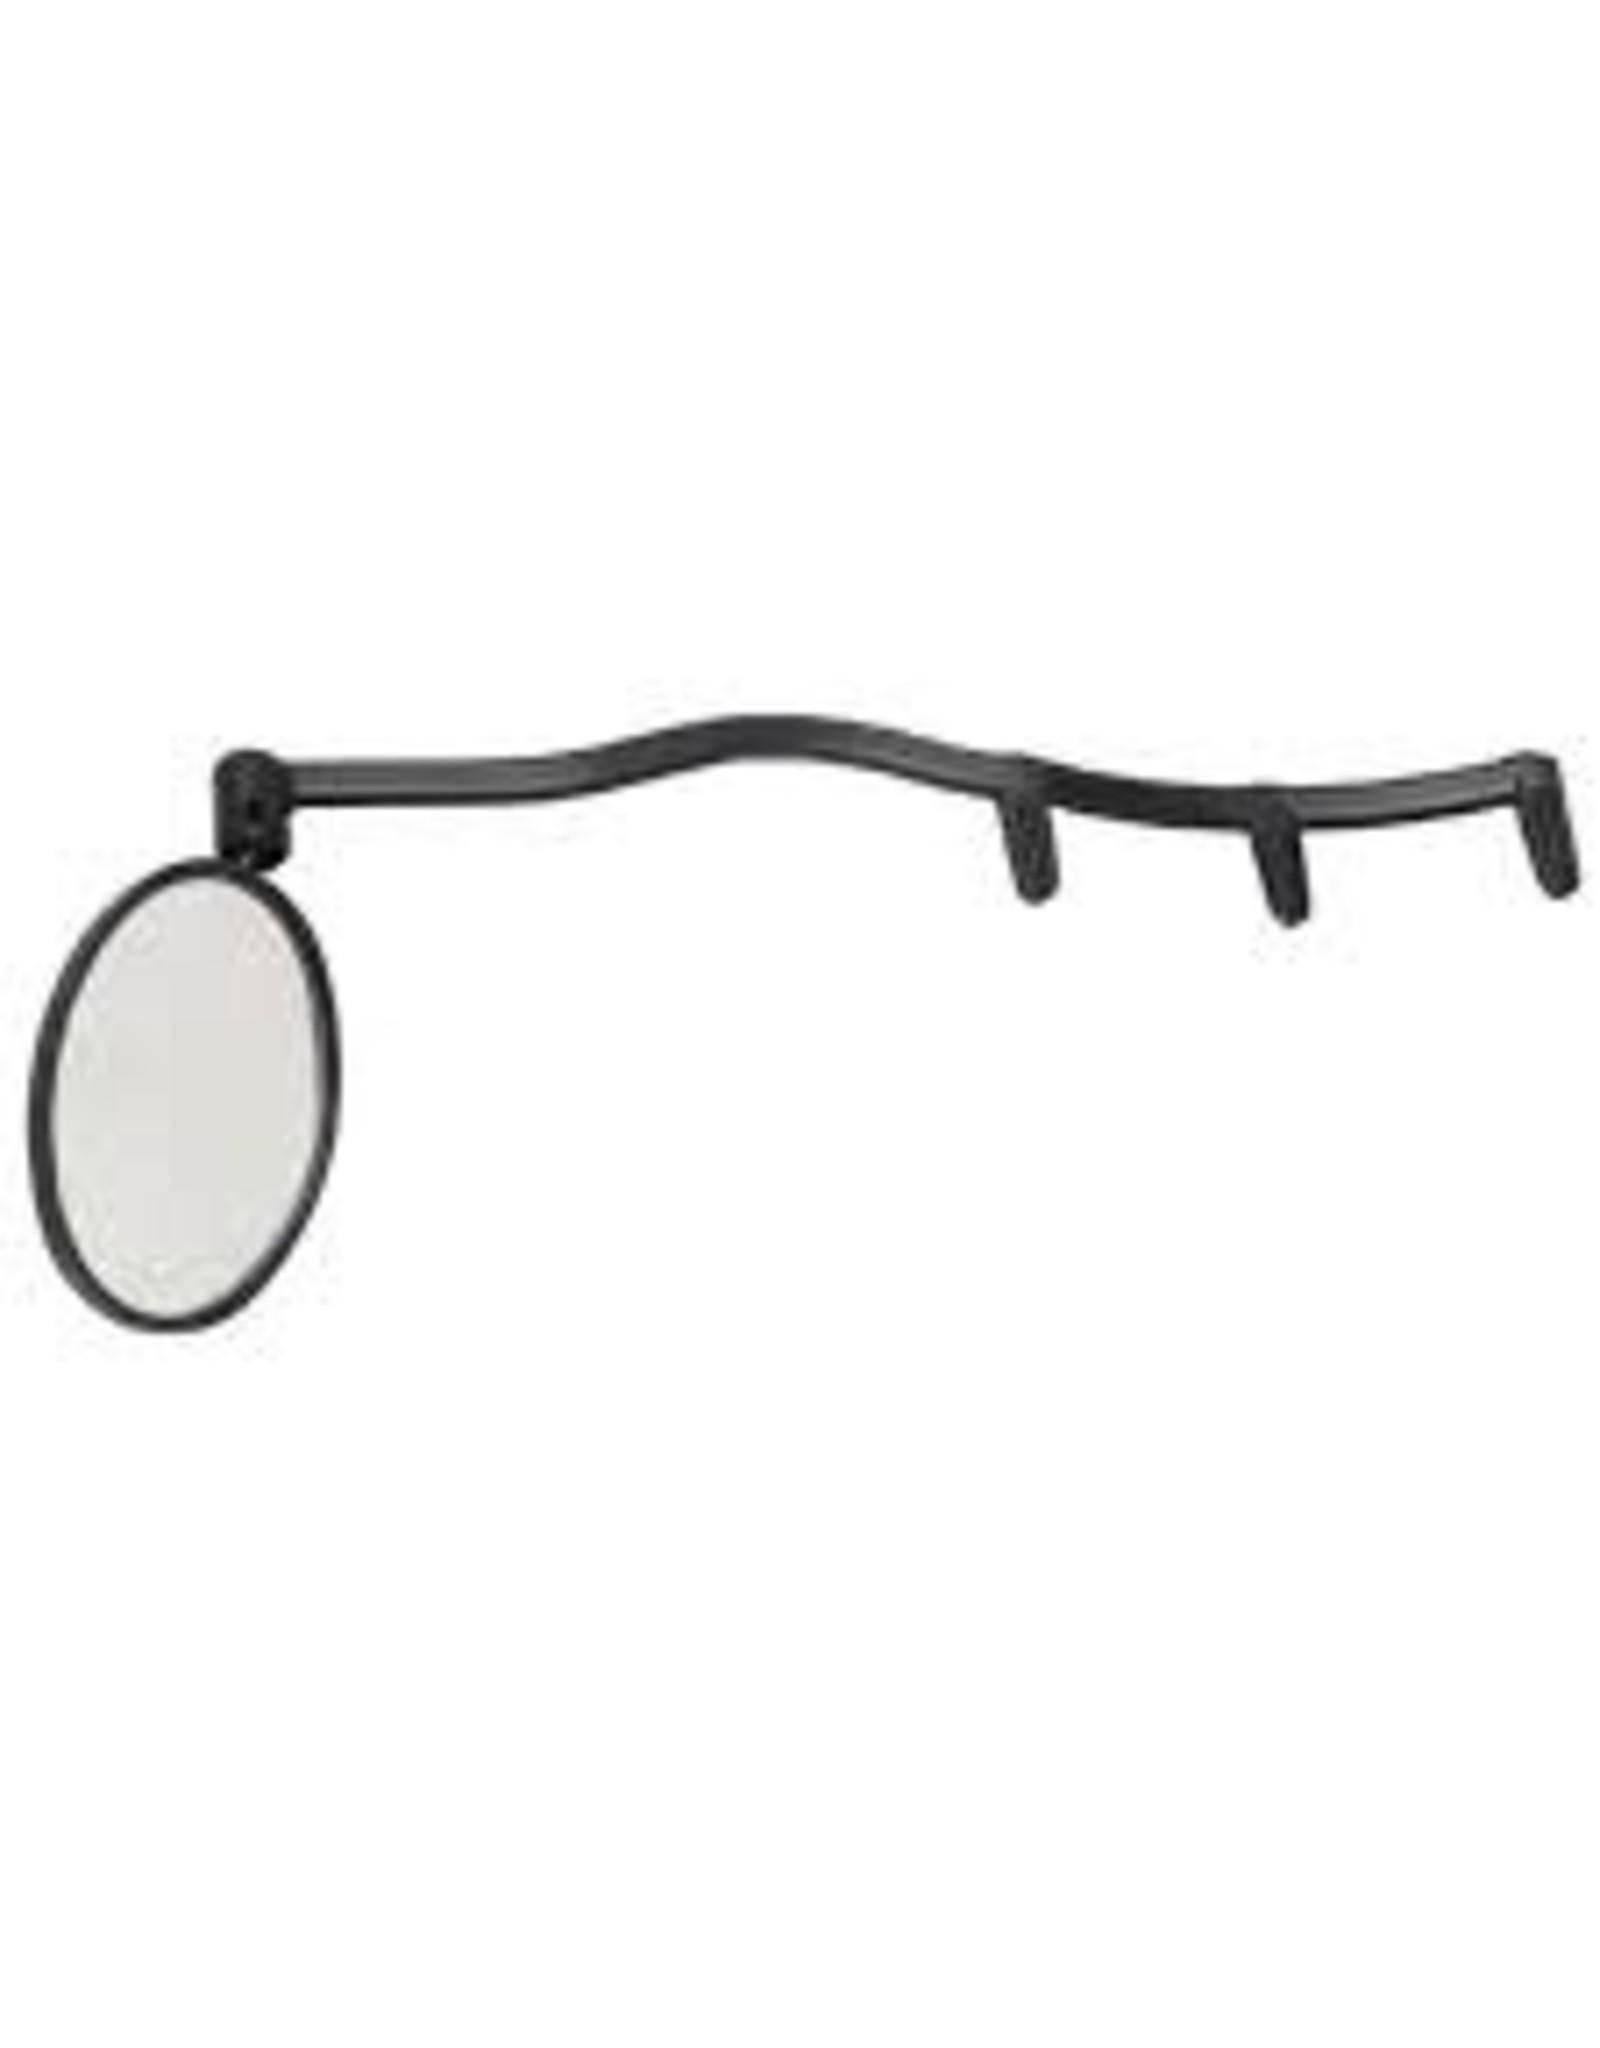 CycleAware Mirror CycleAware Heads Up Eyeglass Mirror: Clip on; Black